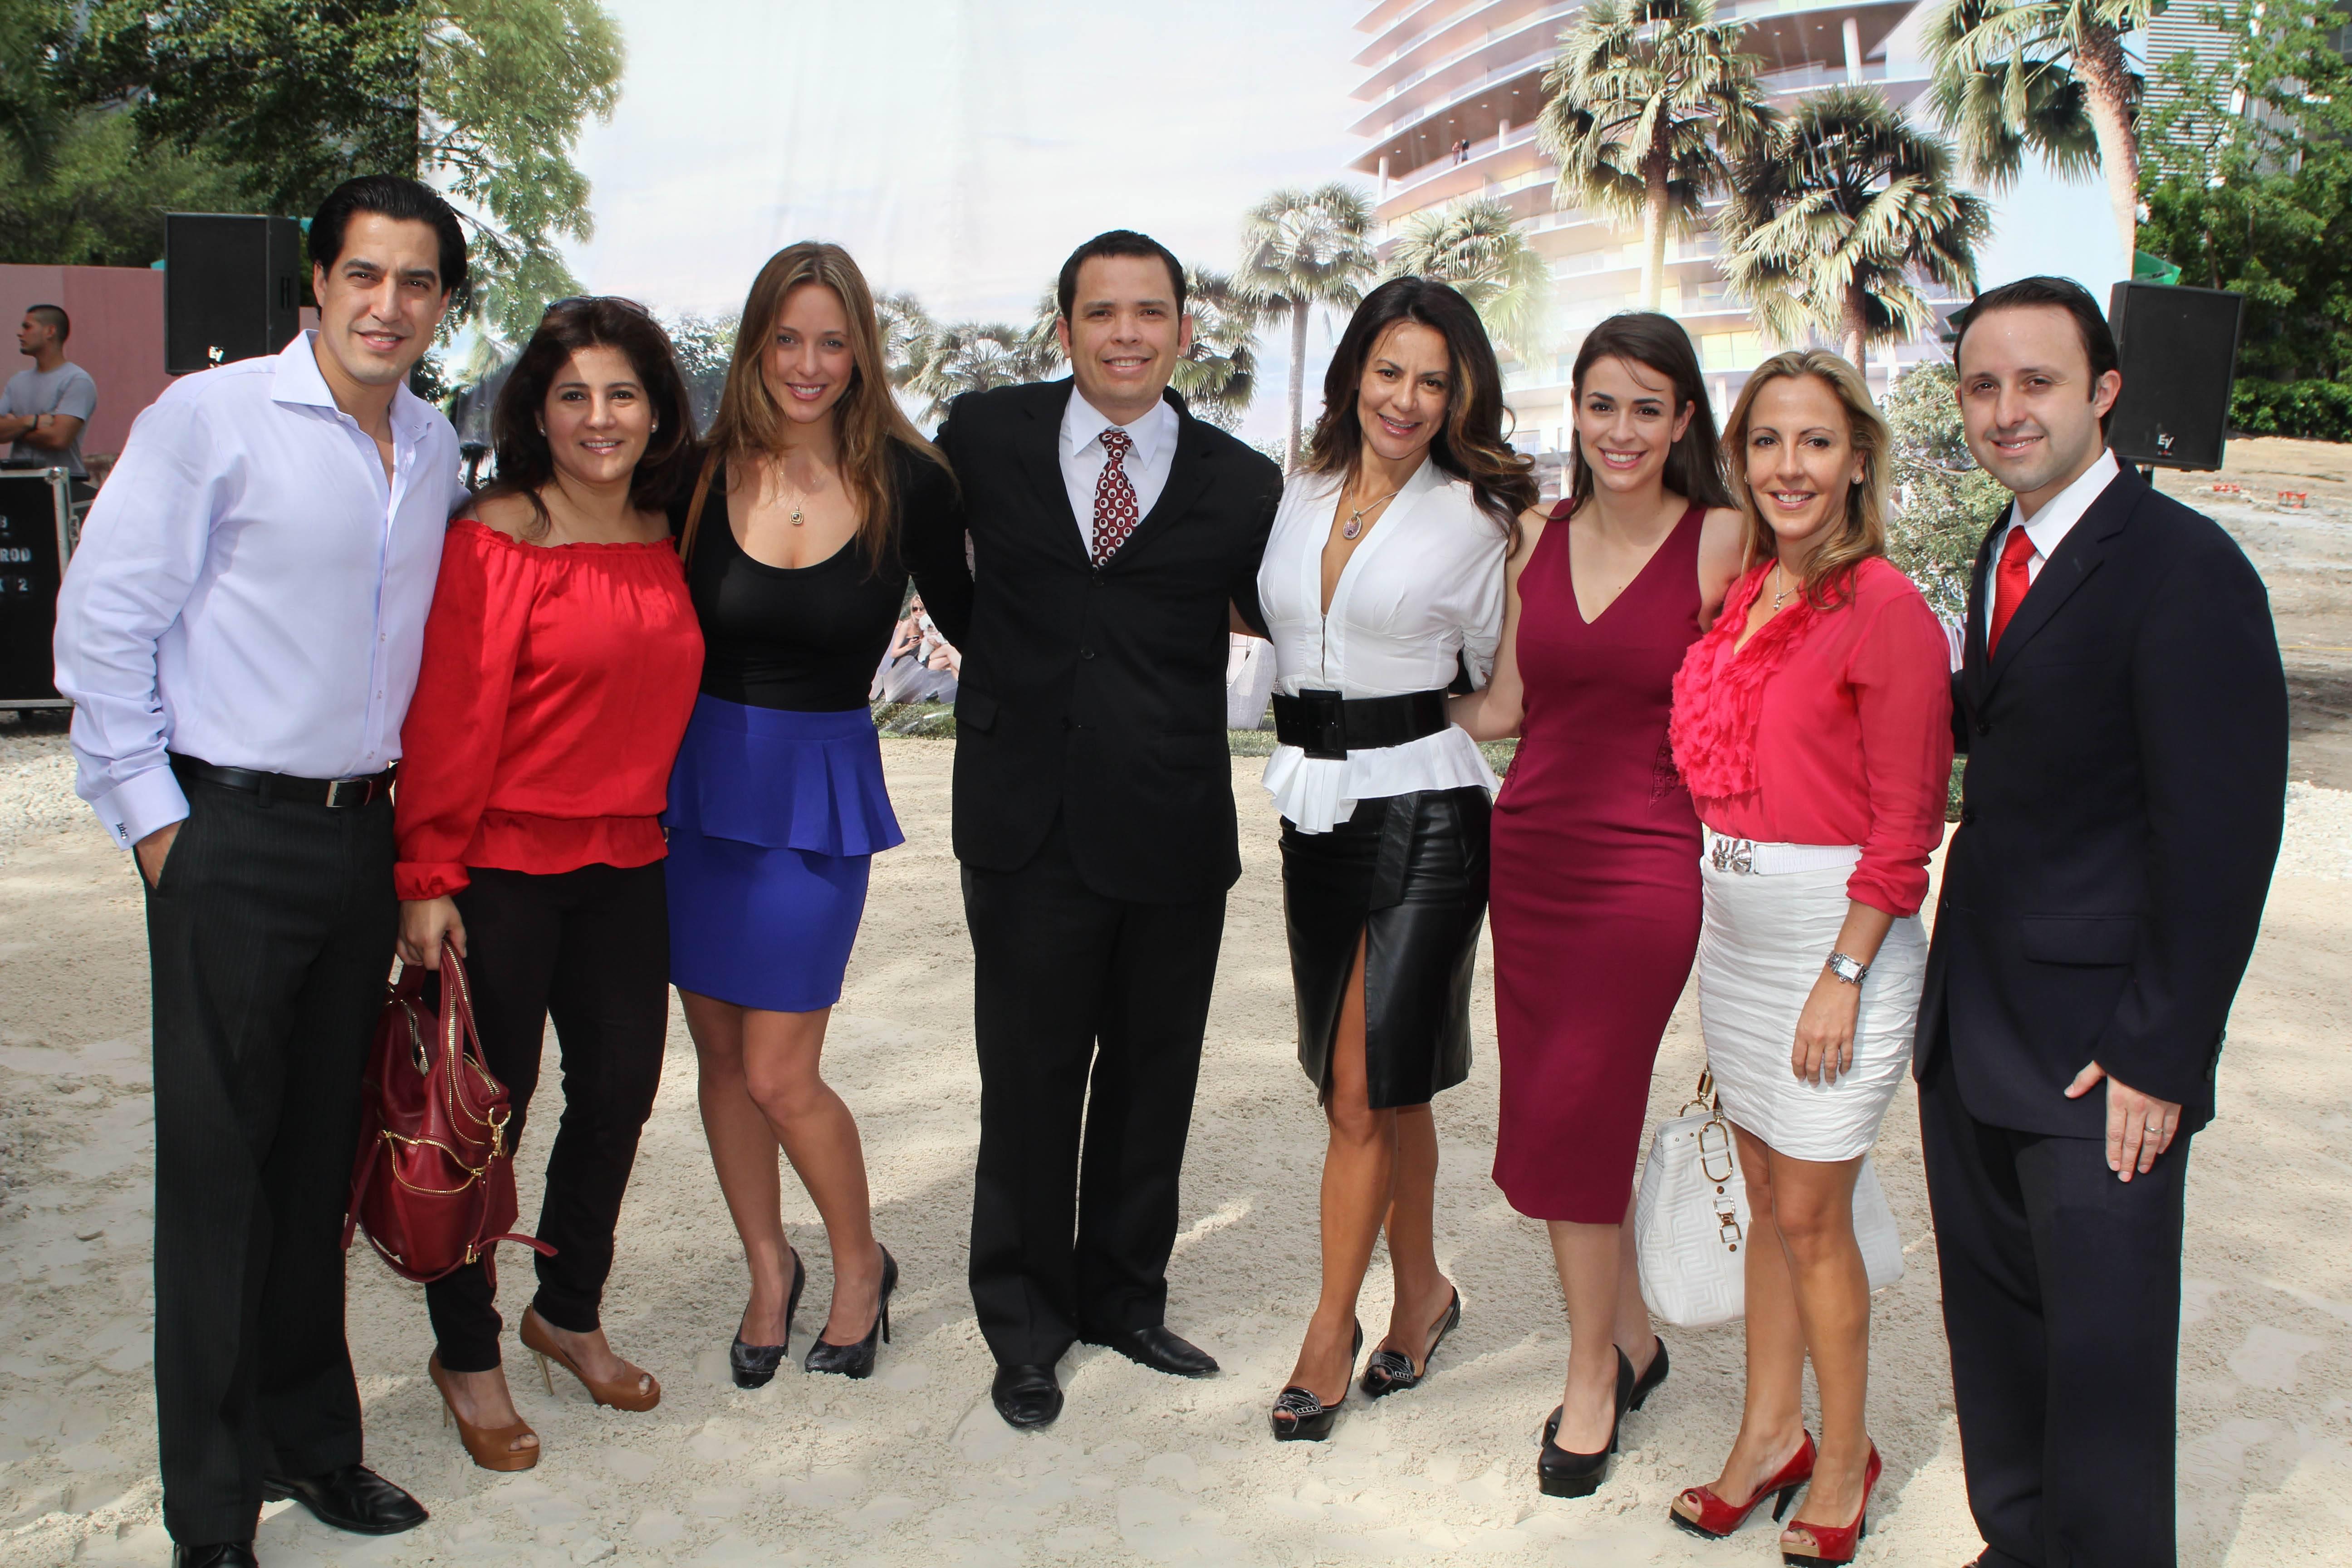 Andres Asion, Aura Aragon, Michelle Minagorri, Hector Pinto, Selene Arvesu, Amy Diaz, Kari Fernandez, Christian Tupper